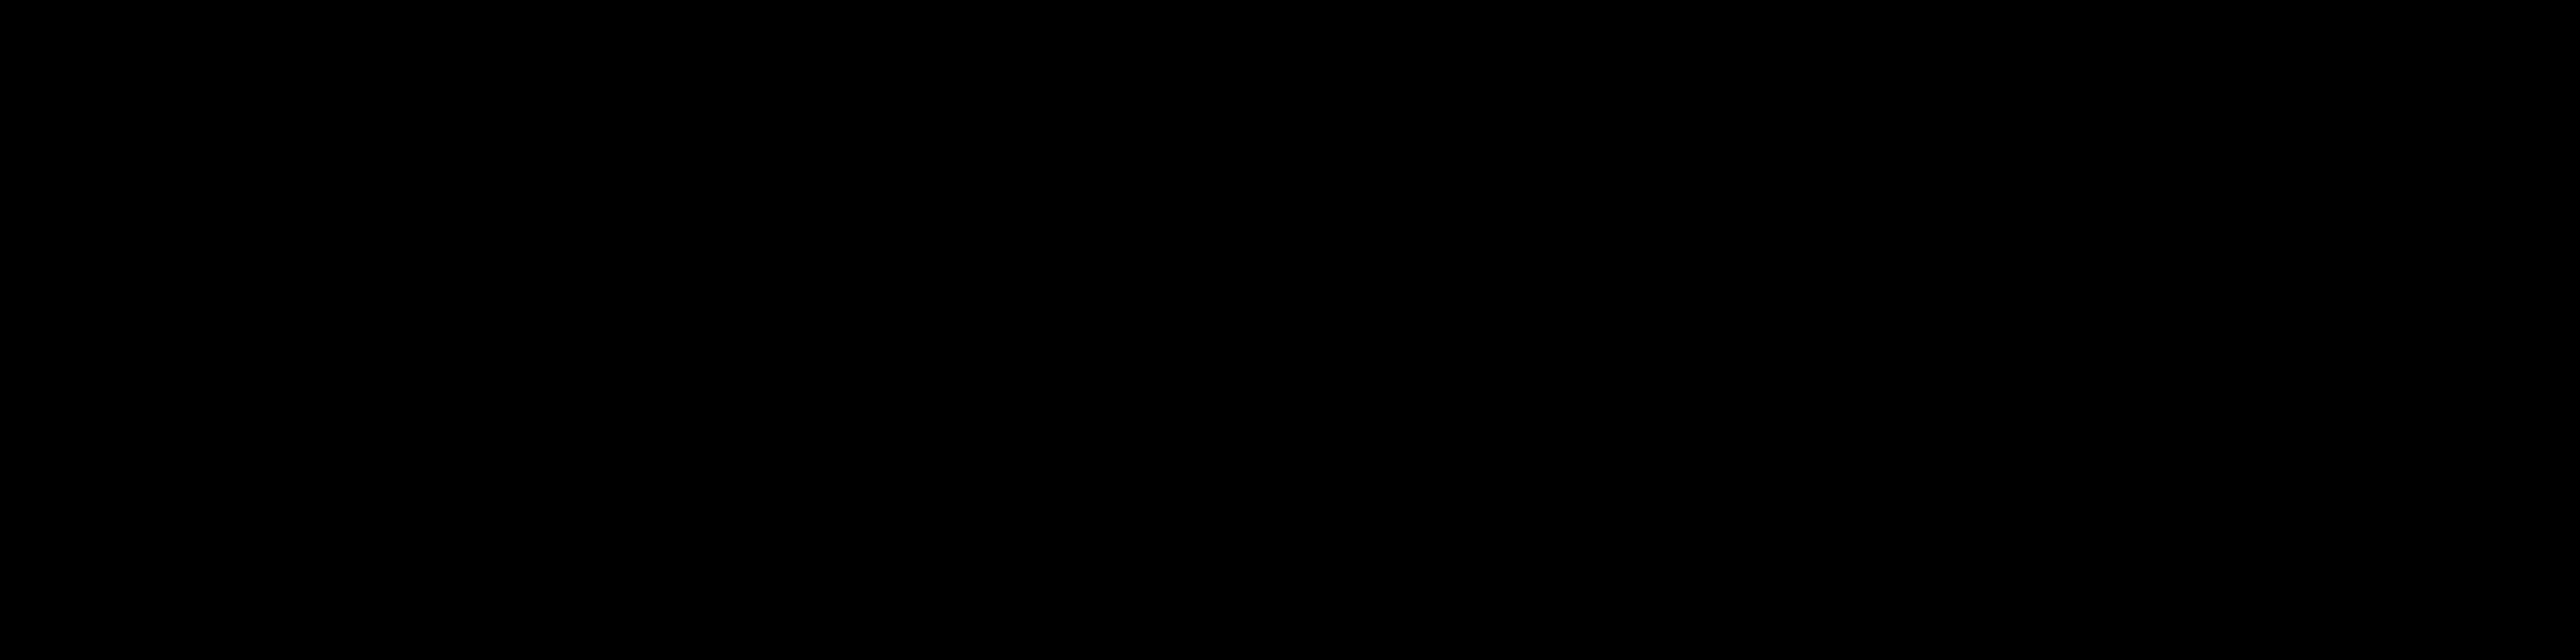 Skyline Silhouette Clip Art.